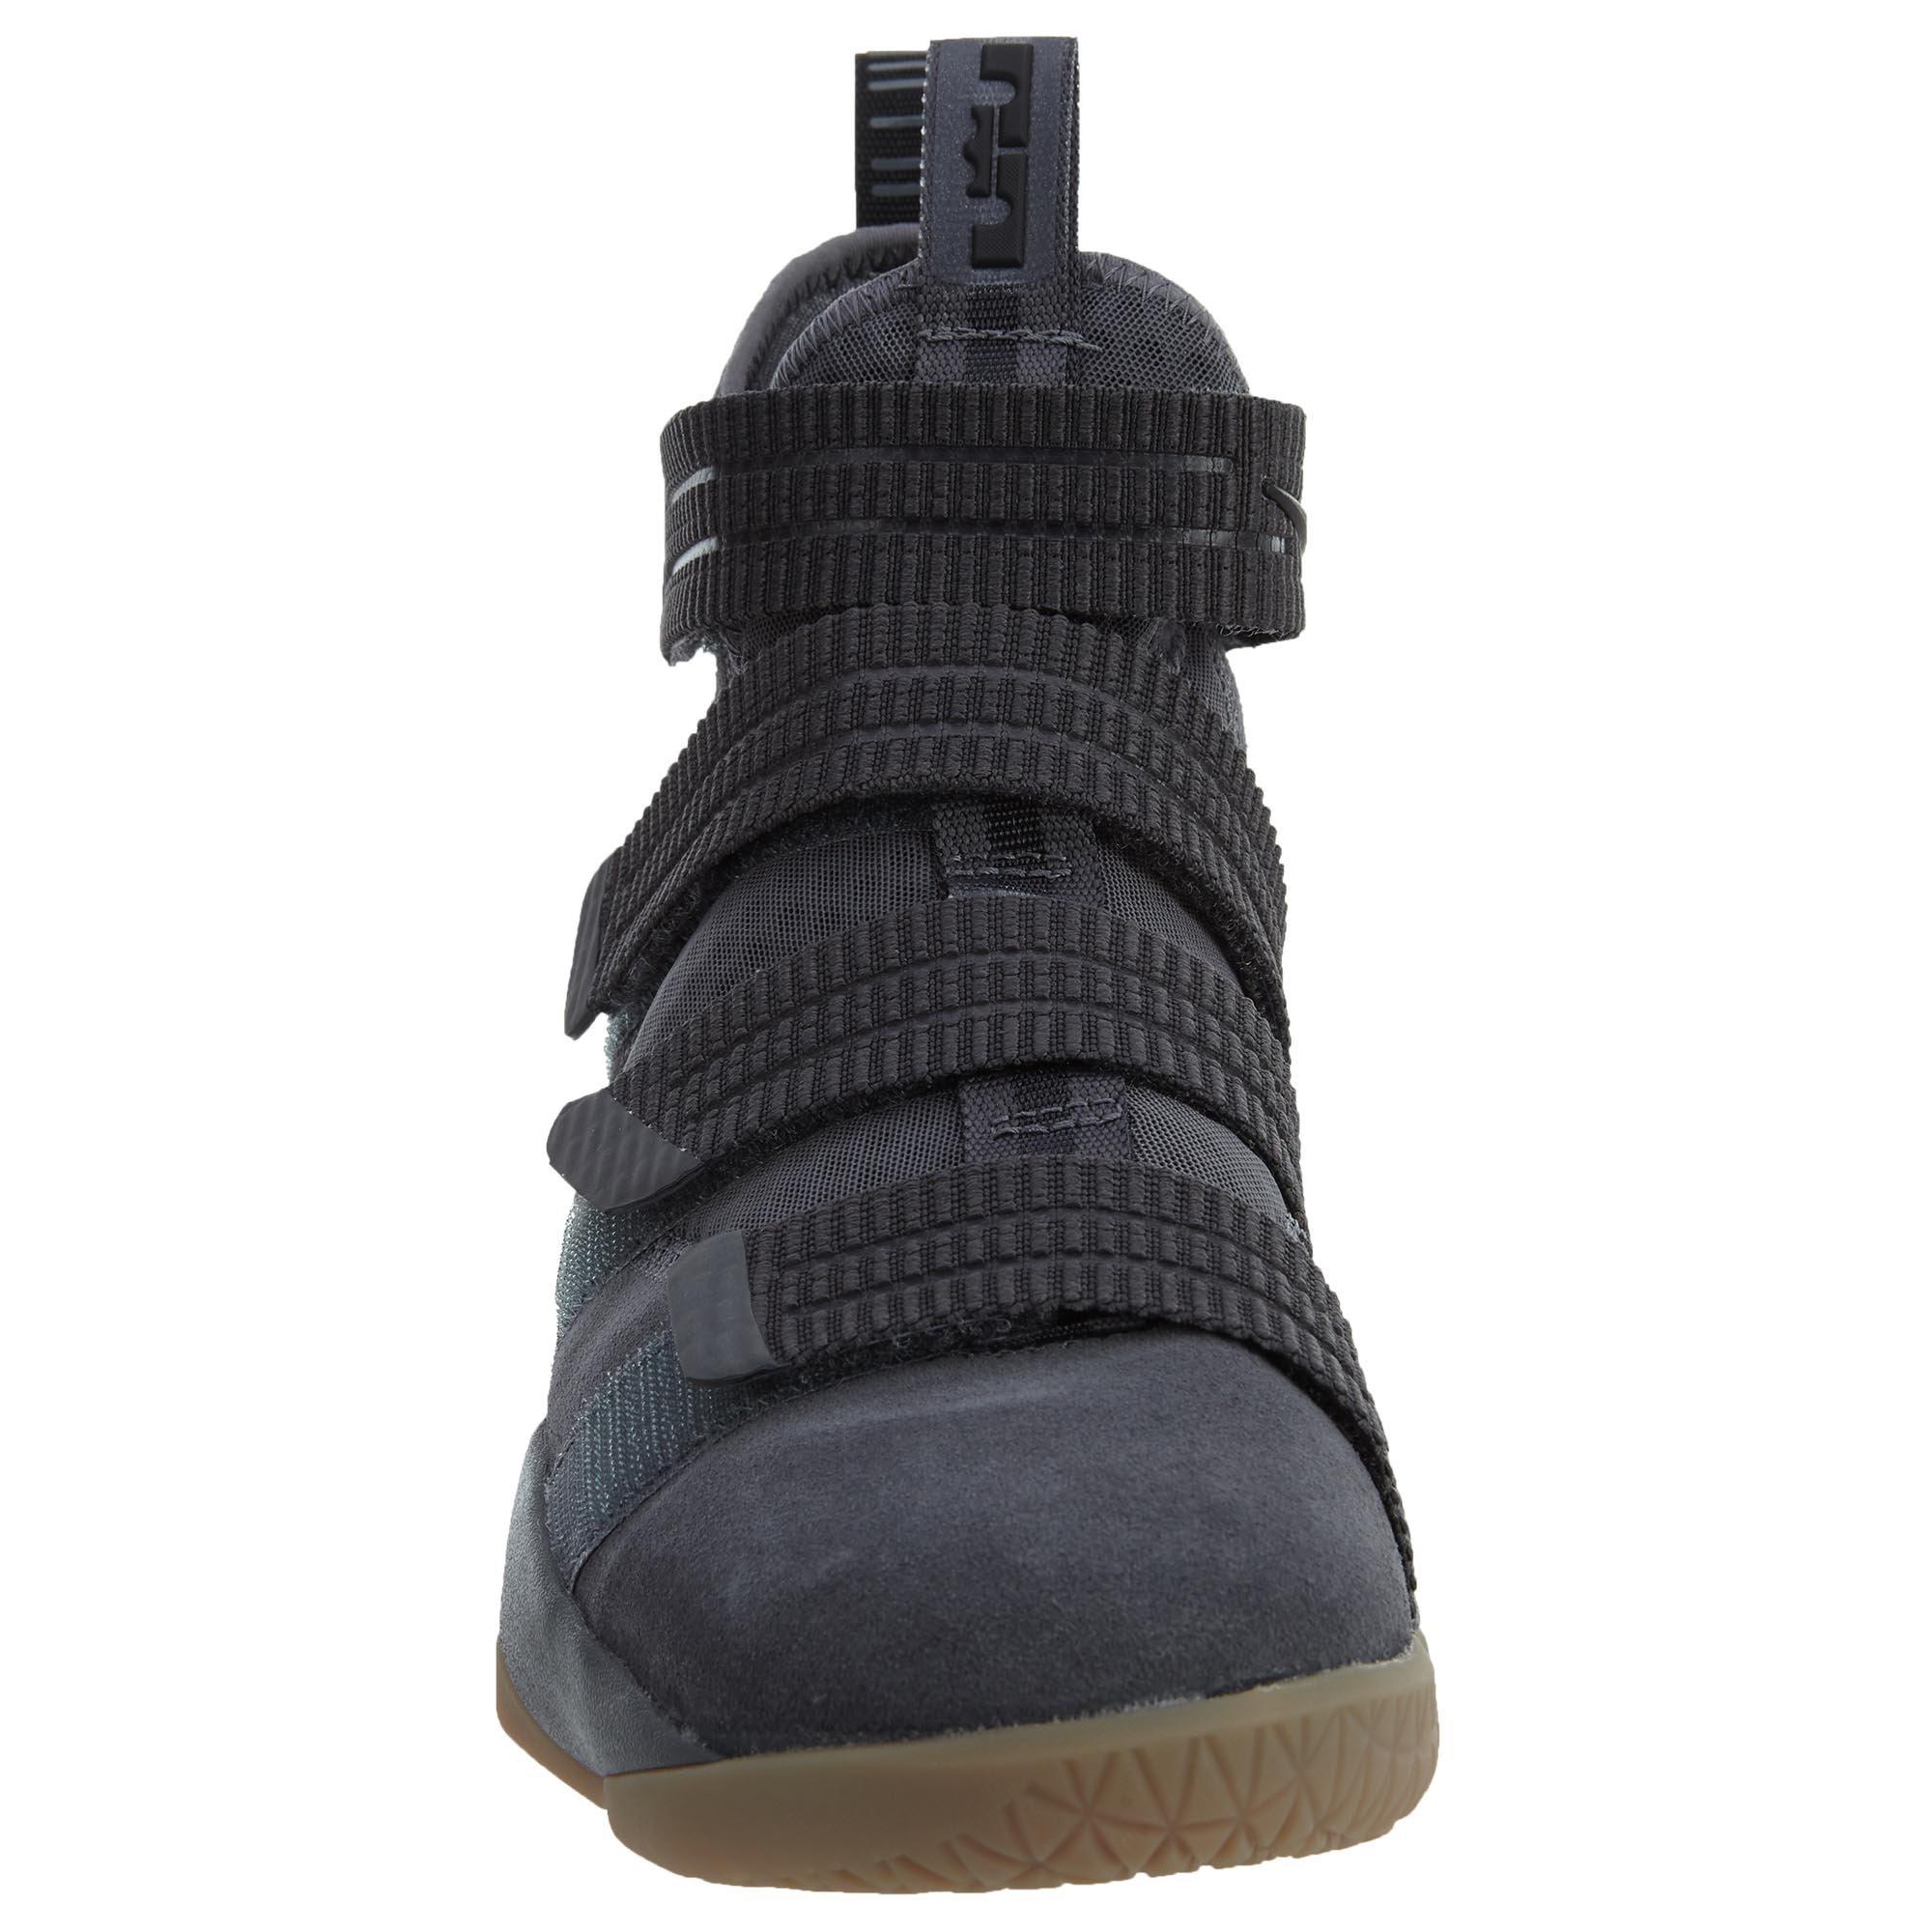 Nike Lebron Soldier XI SFG